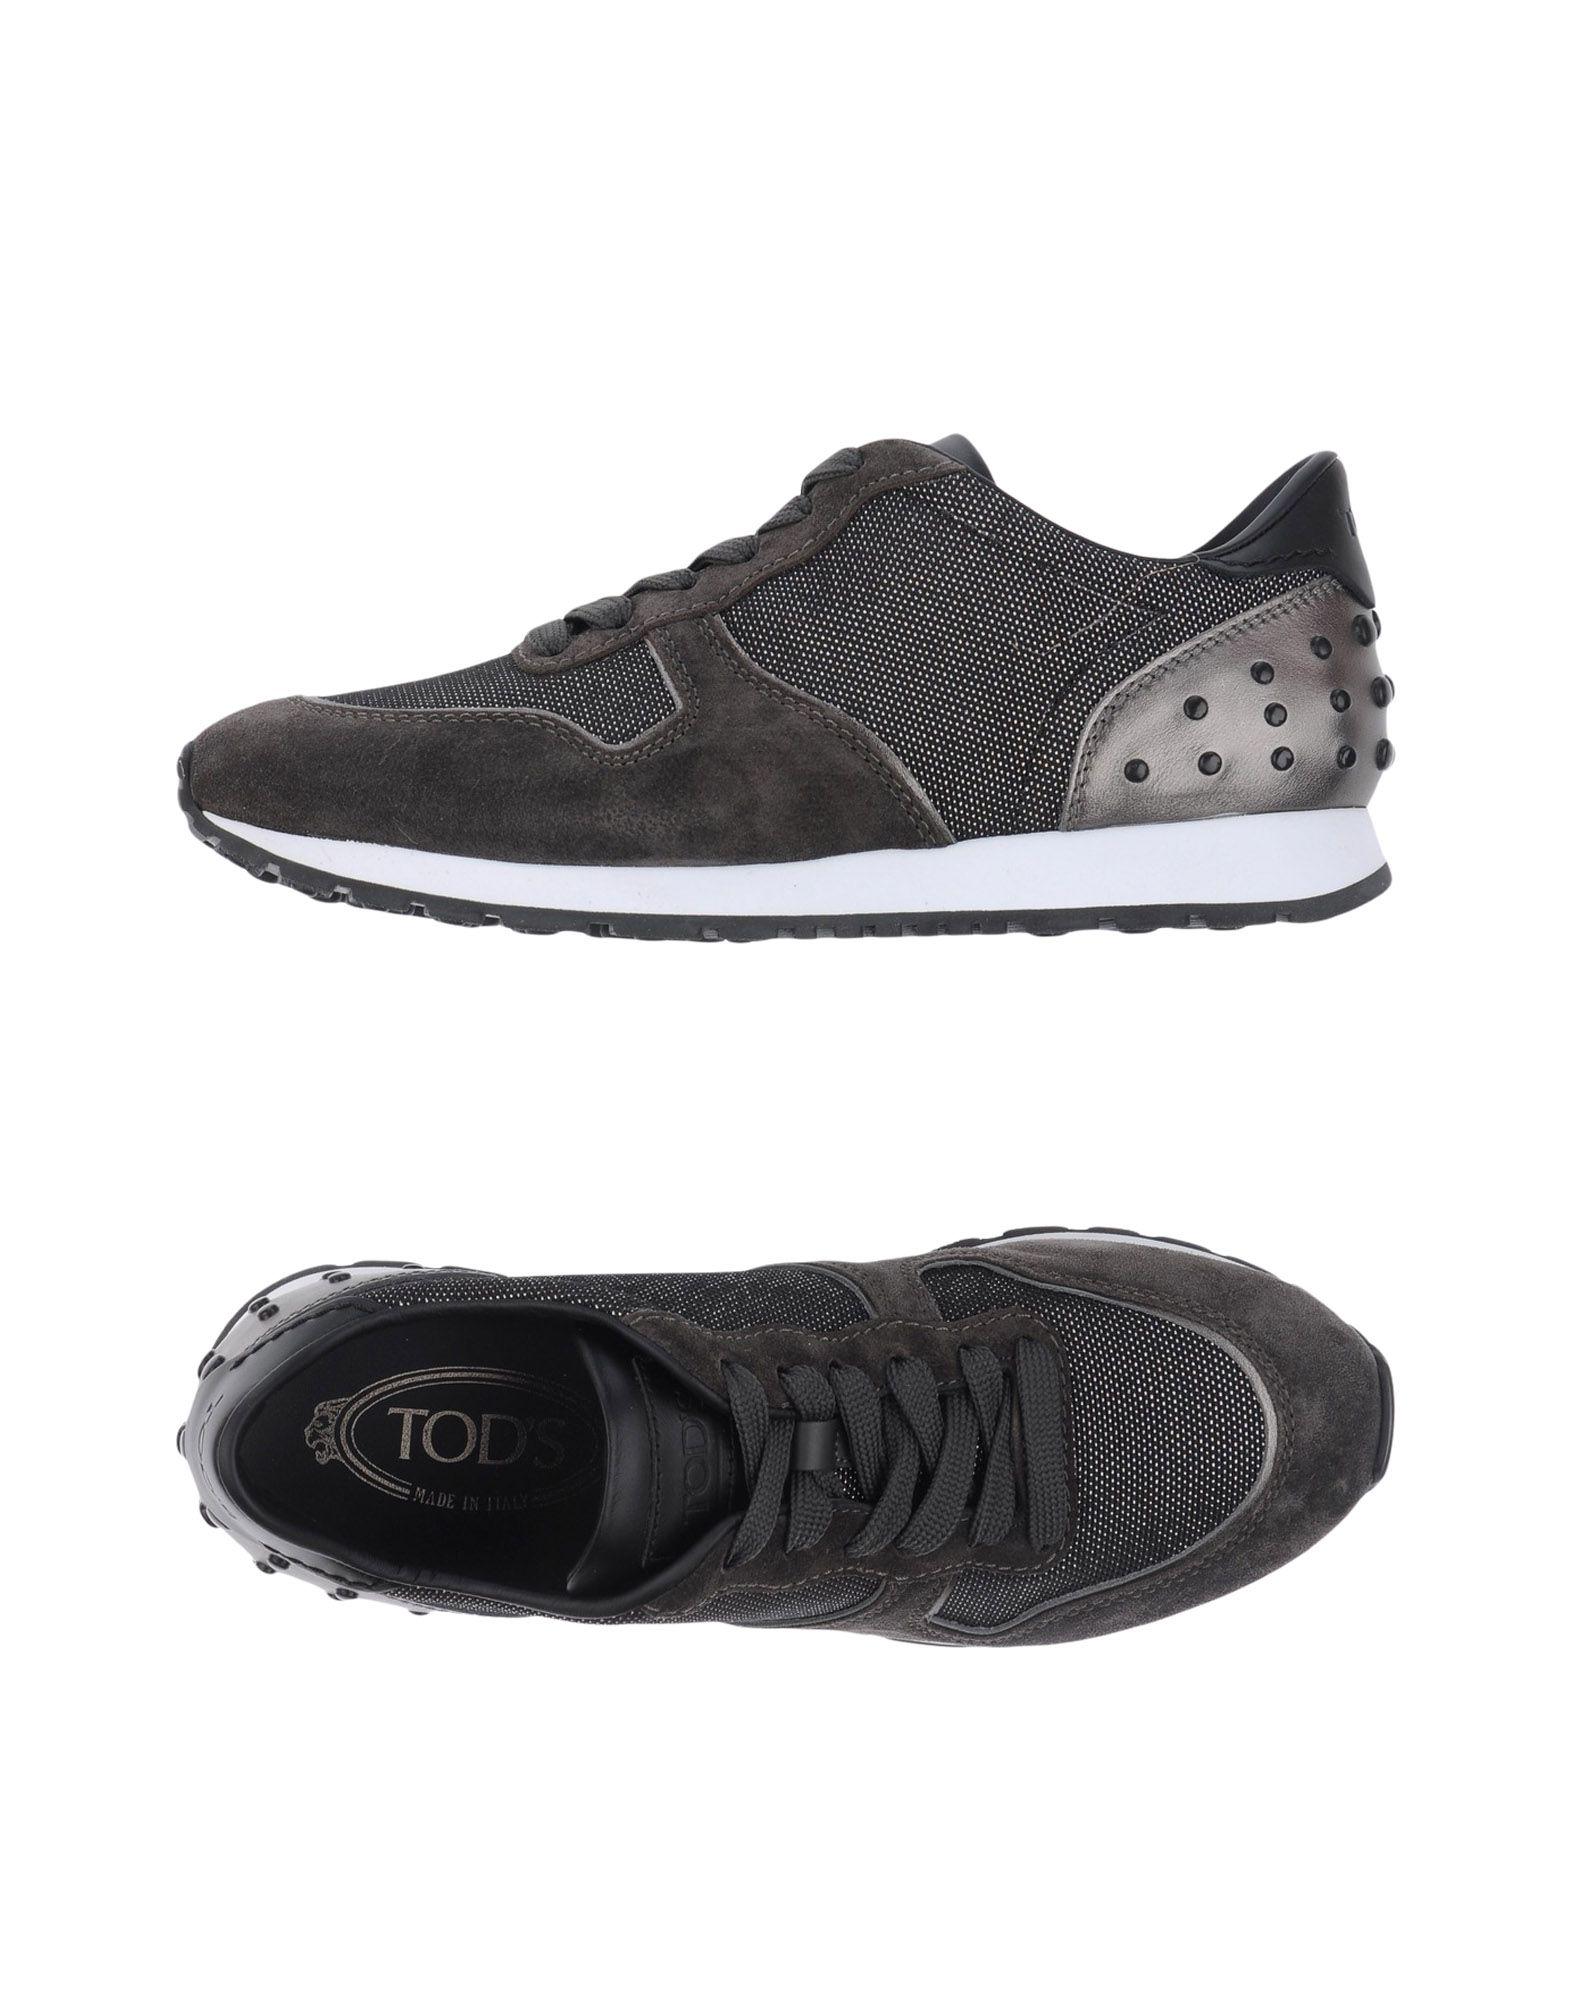 Tod's Sneakers Sneakers - Women Tod's Sneakers Tod's online on  Canada - 11241410OP b63800